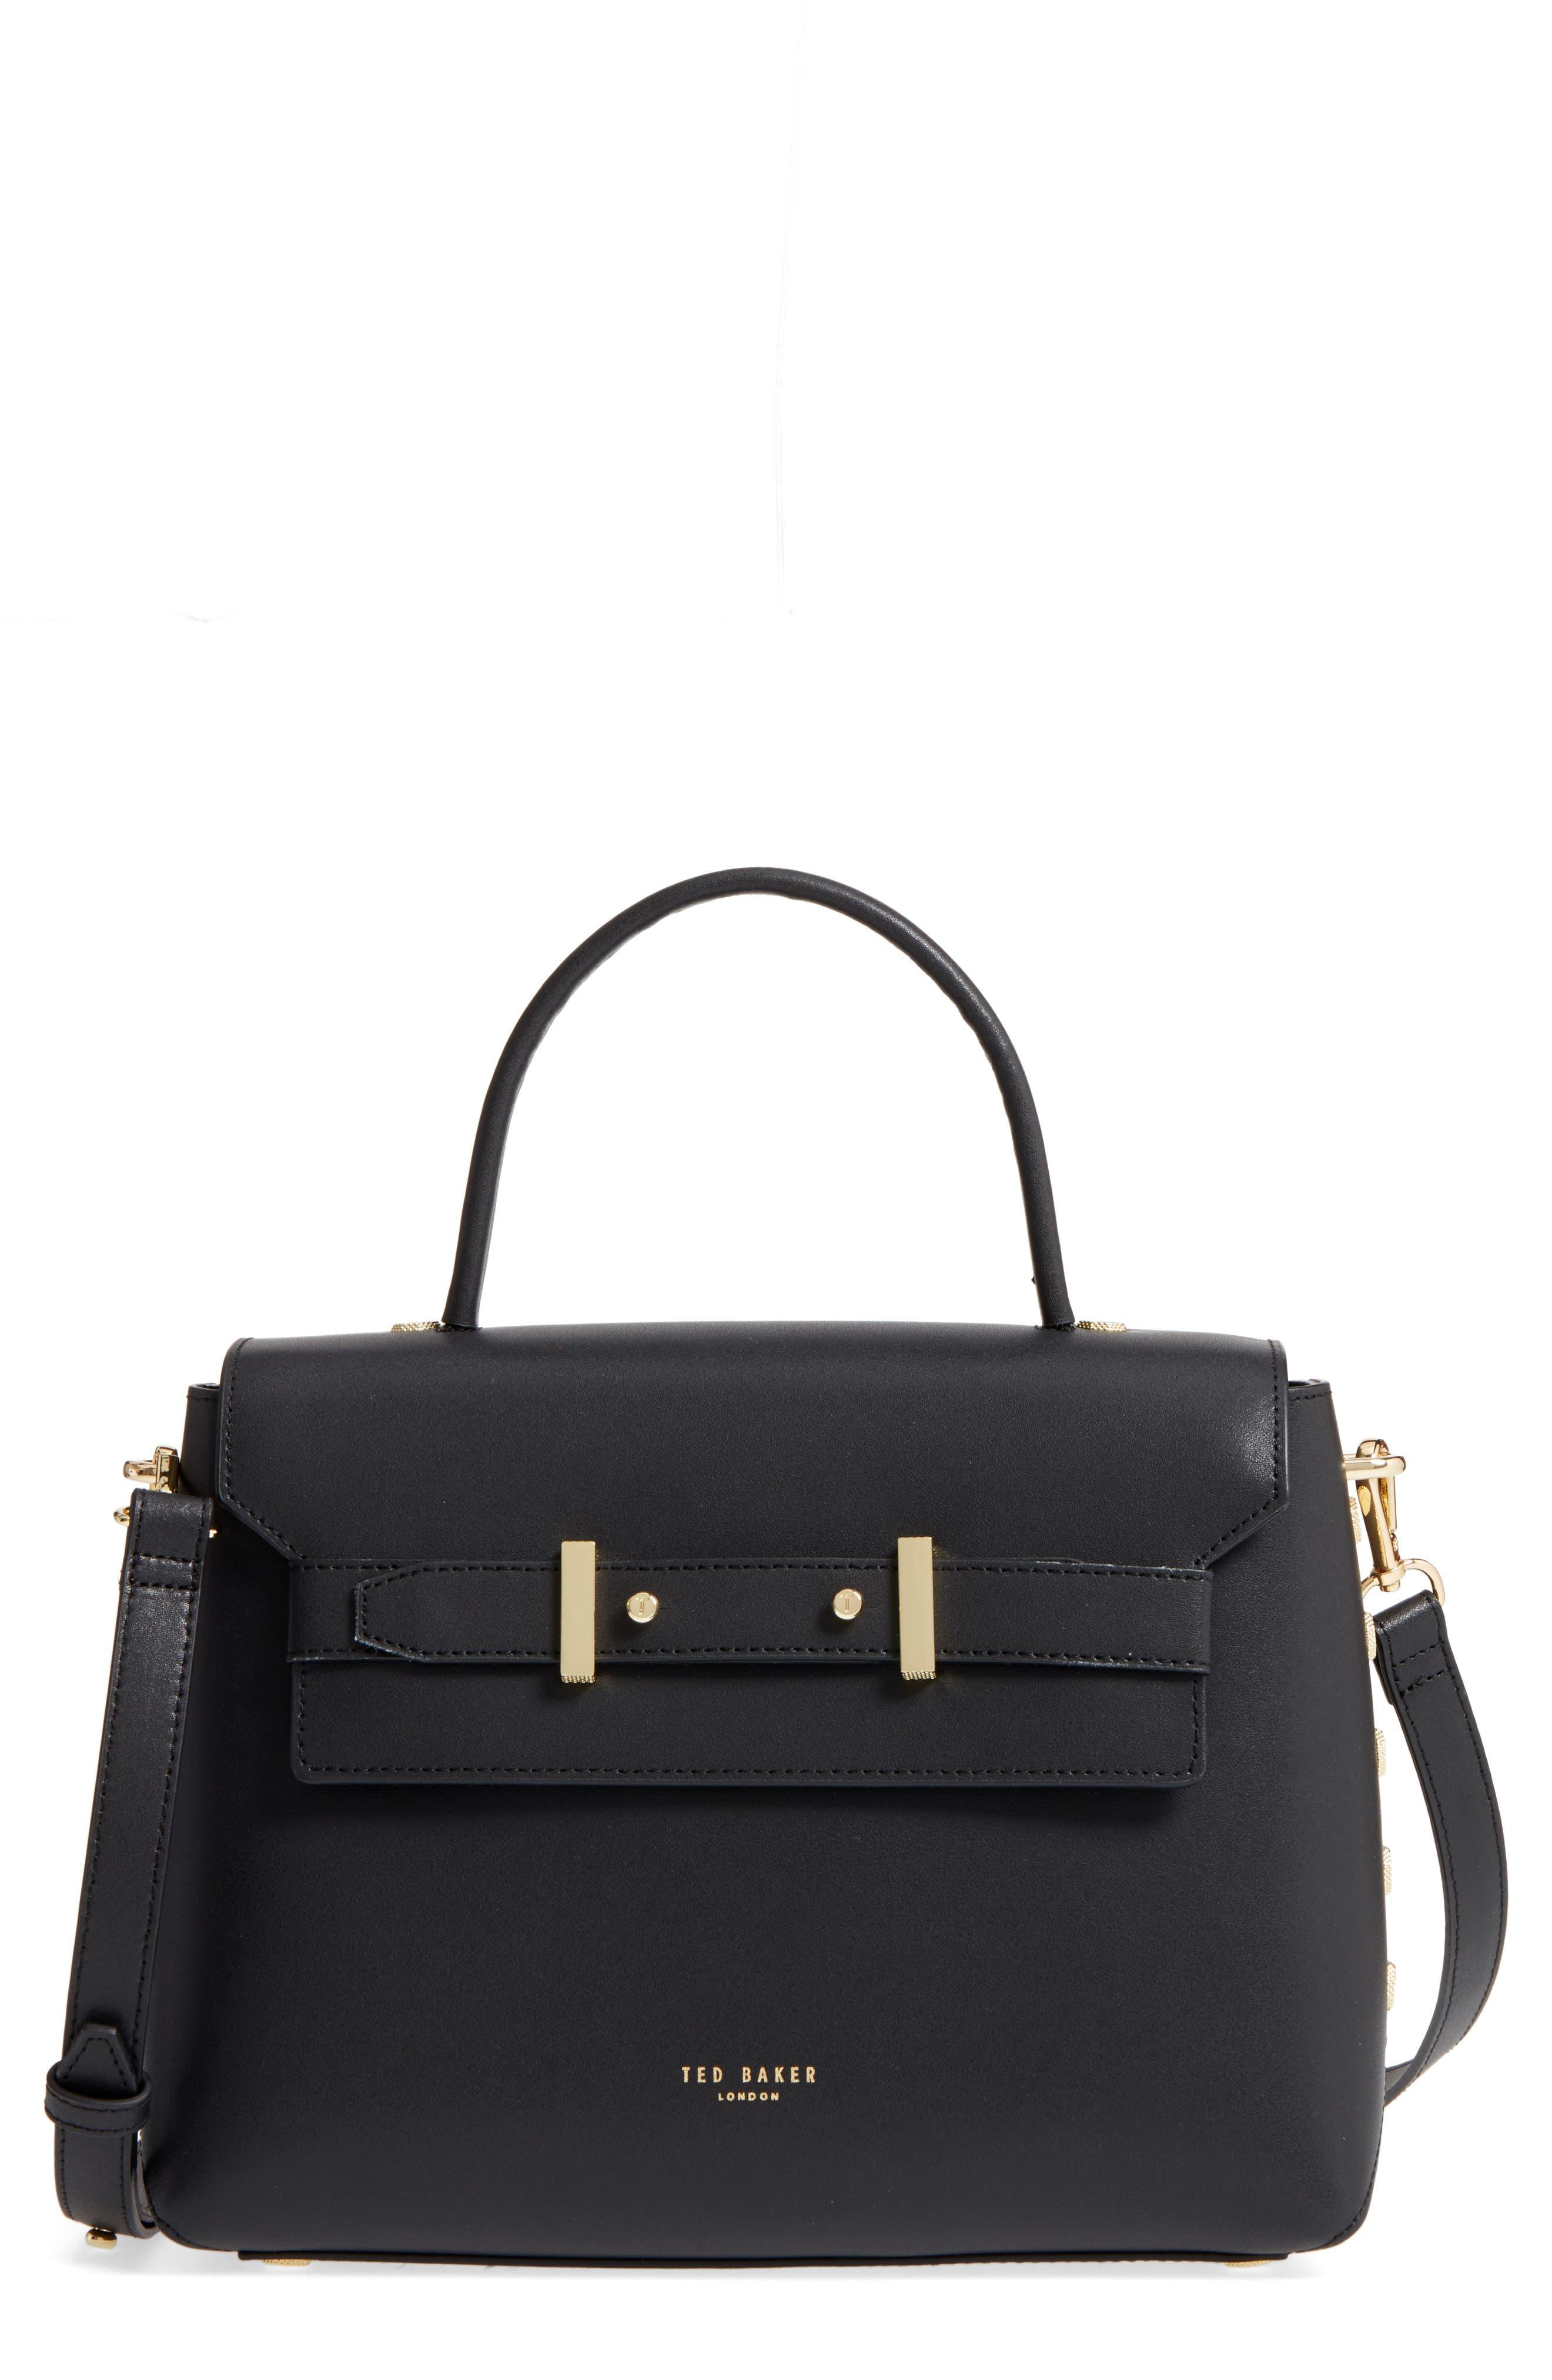 Taymar - Studded Edge Lady Bag Leather Top Handle Satchel,                         Main,                         color, Black